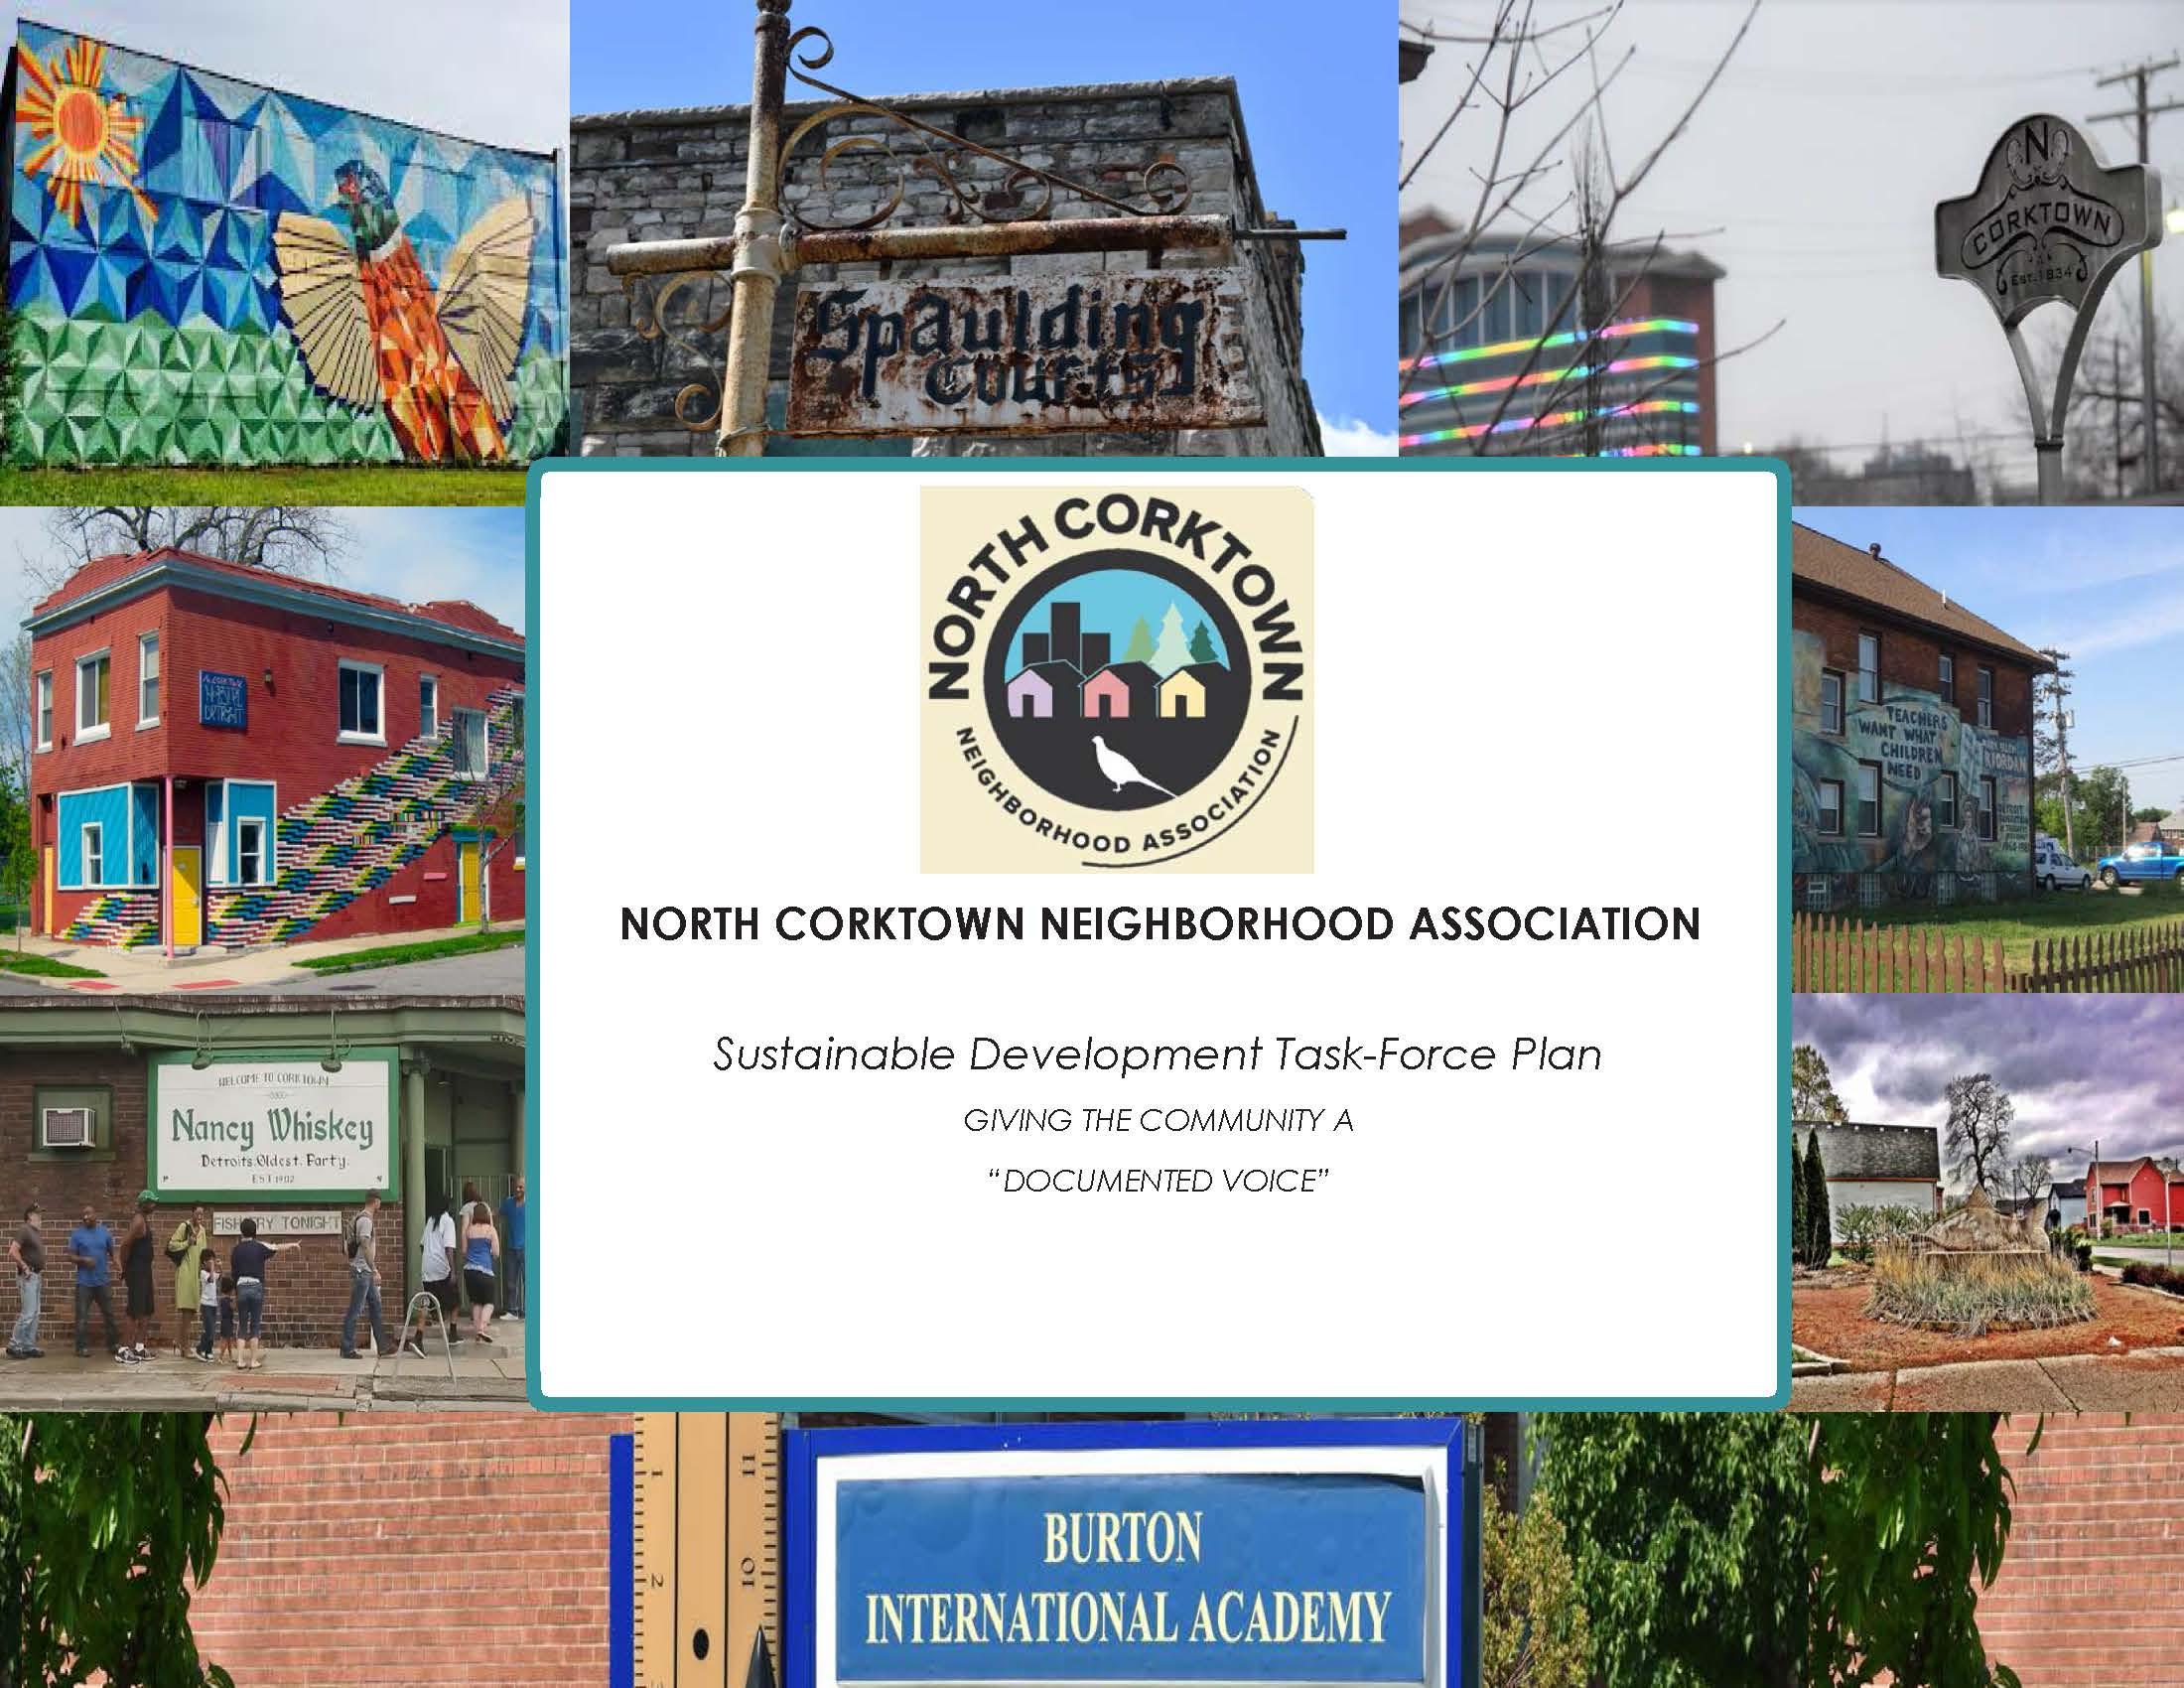 North Corktown Neighborhood Association Sustainable Development Task-Force Plan